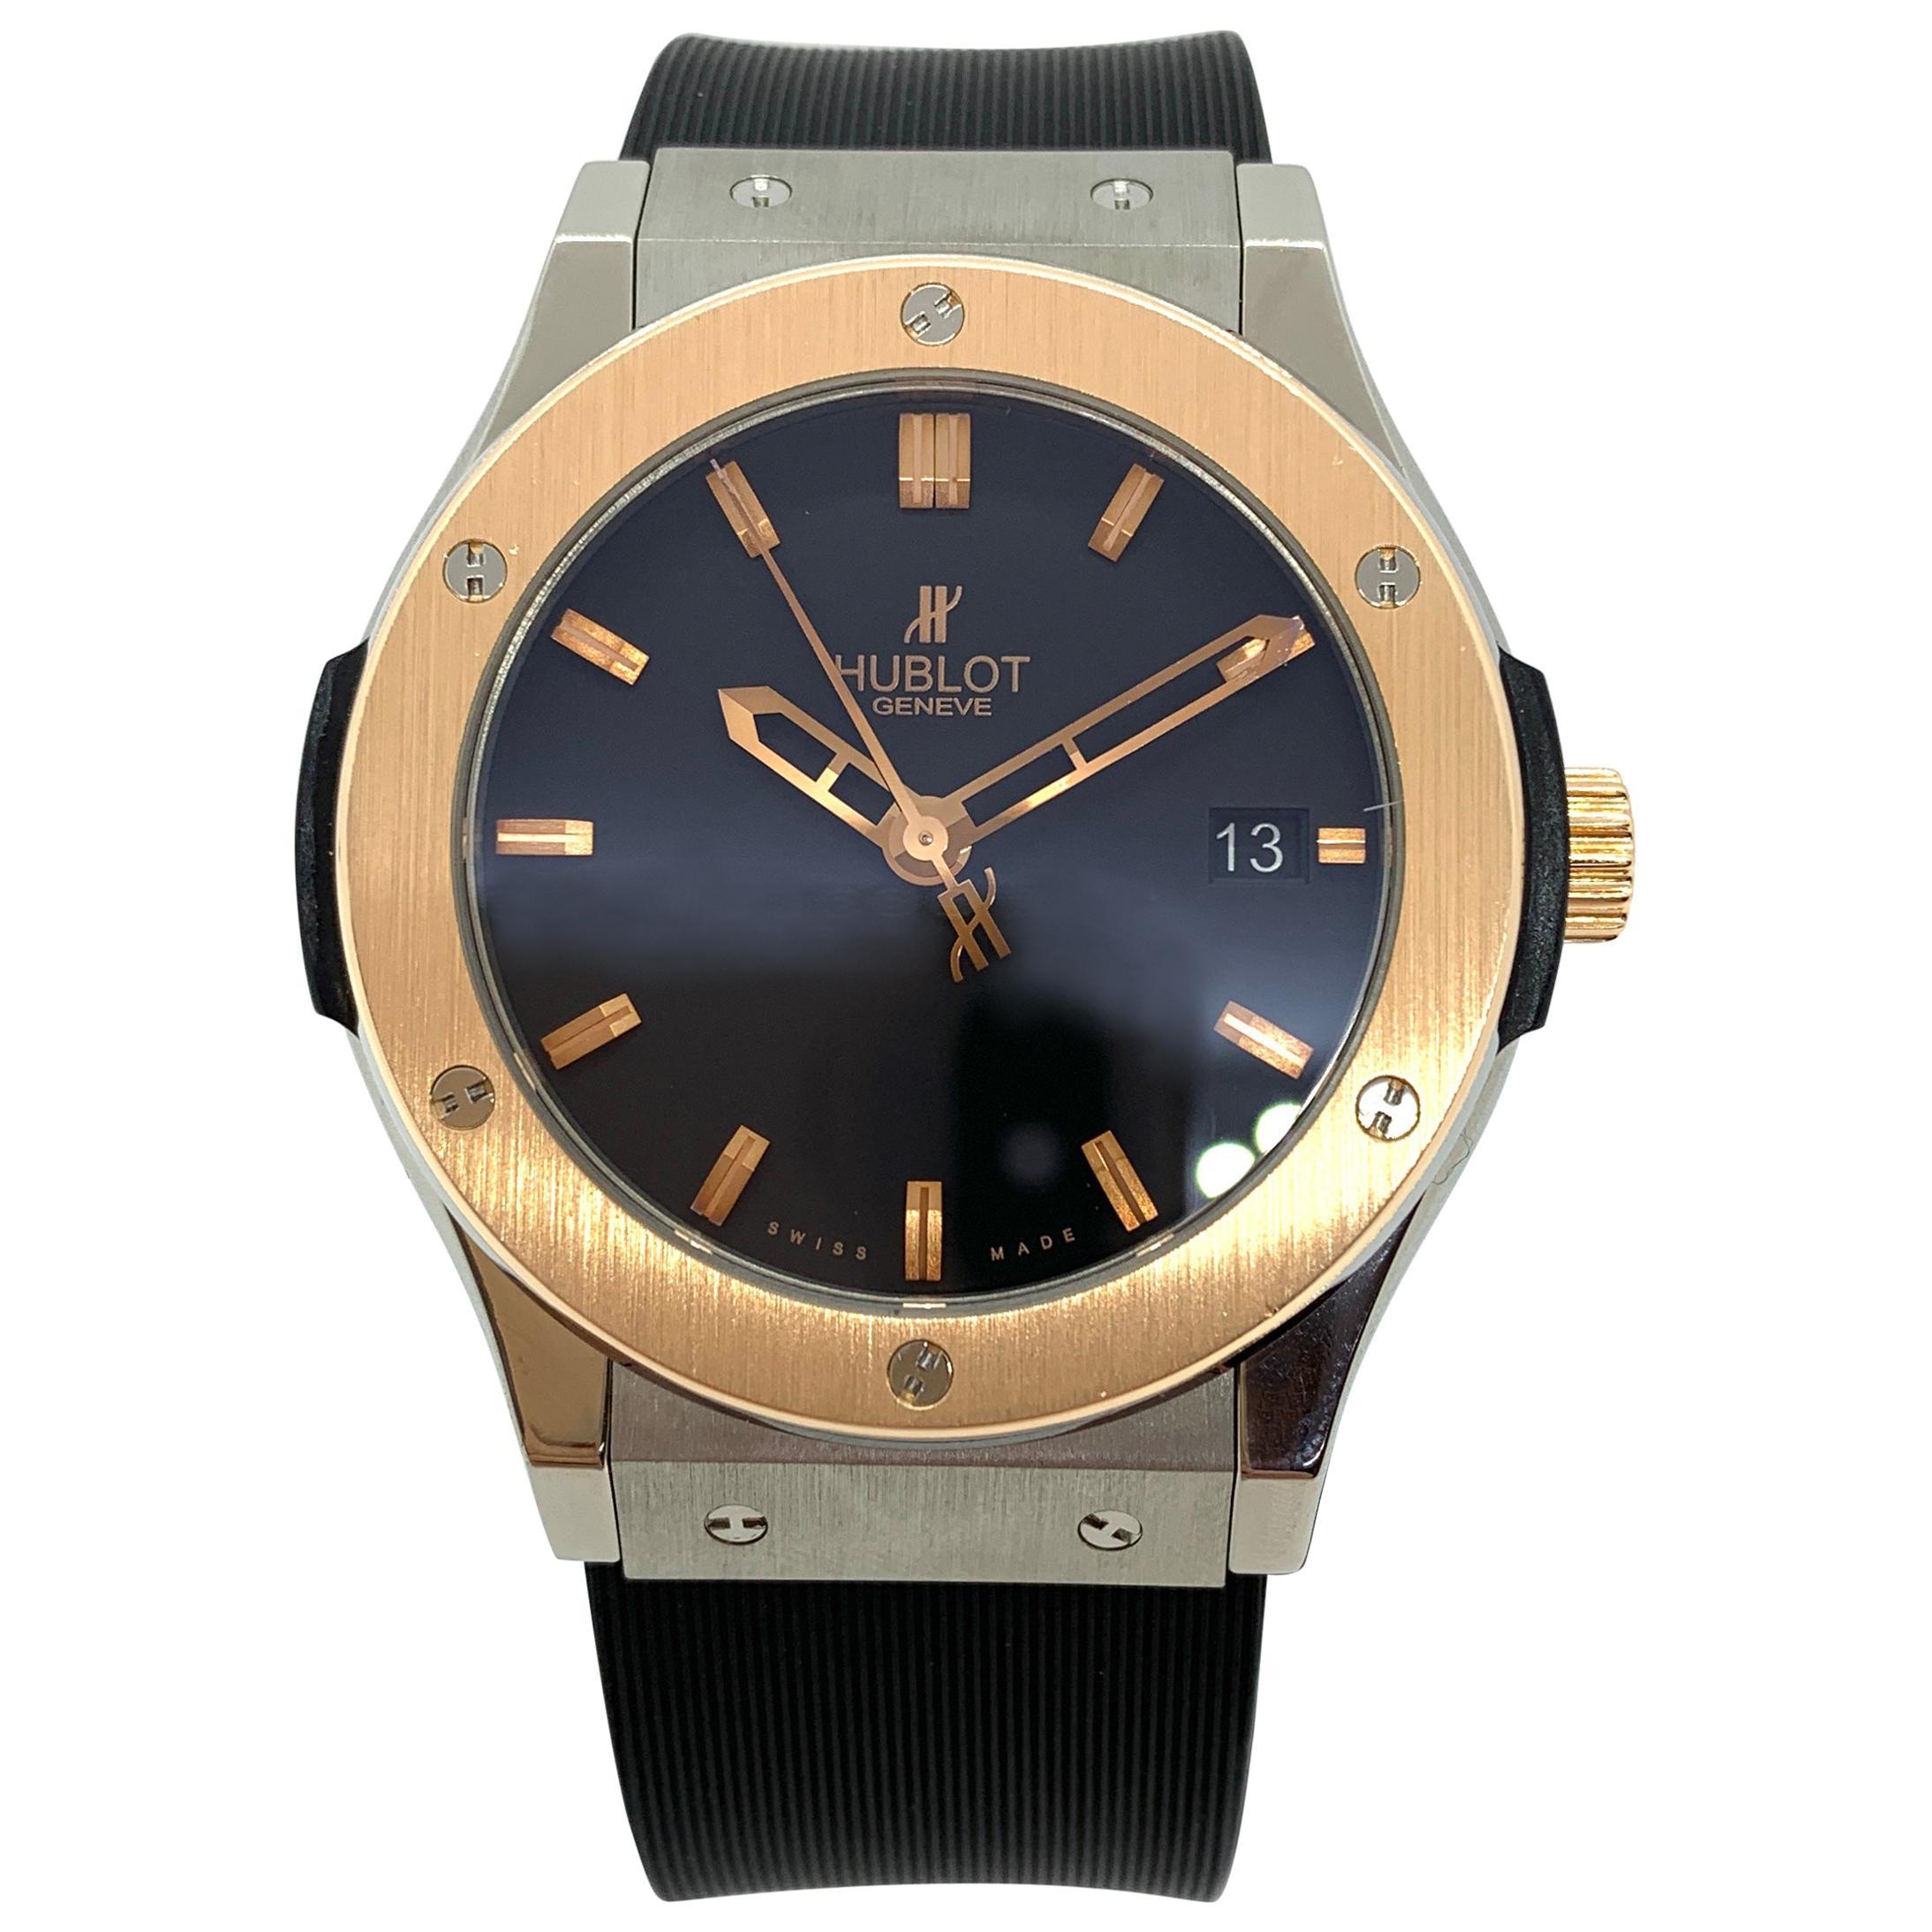 Hublot Classic Fusion Automatic Wristwatch, Titanium and 18 Karat Gold